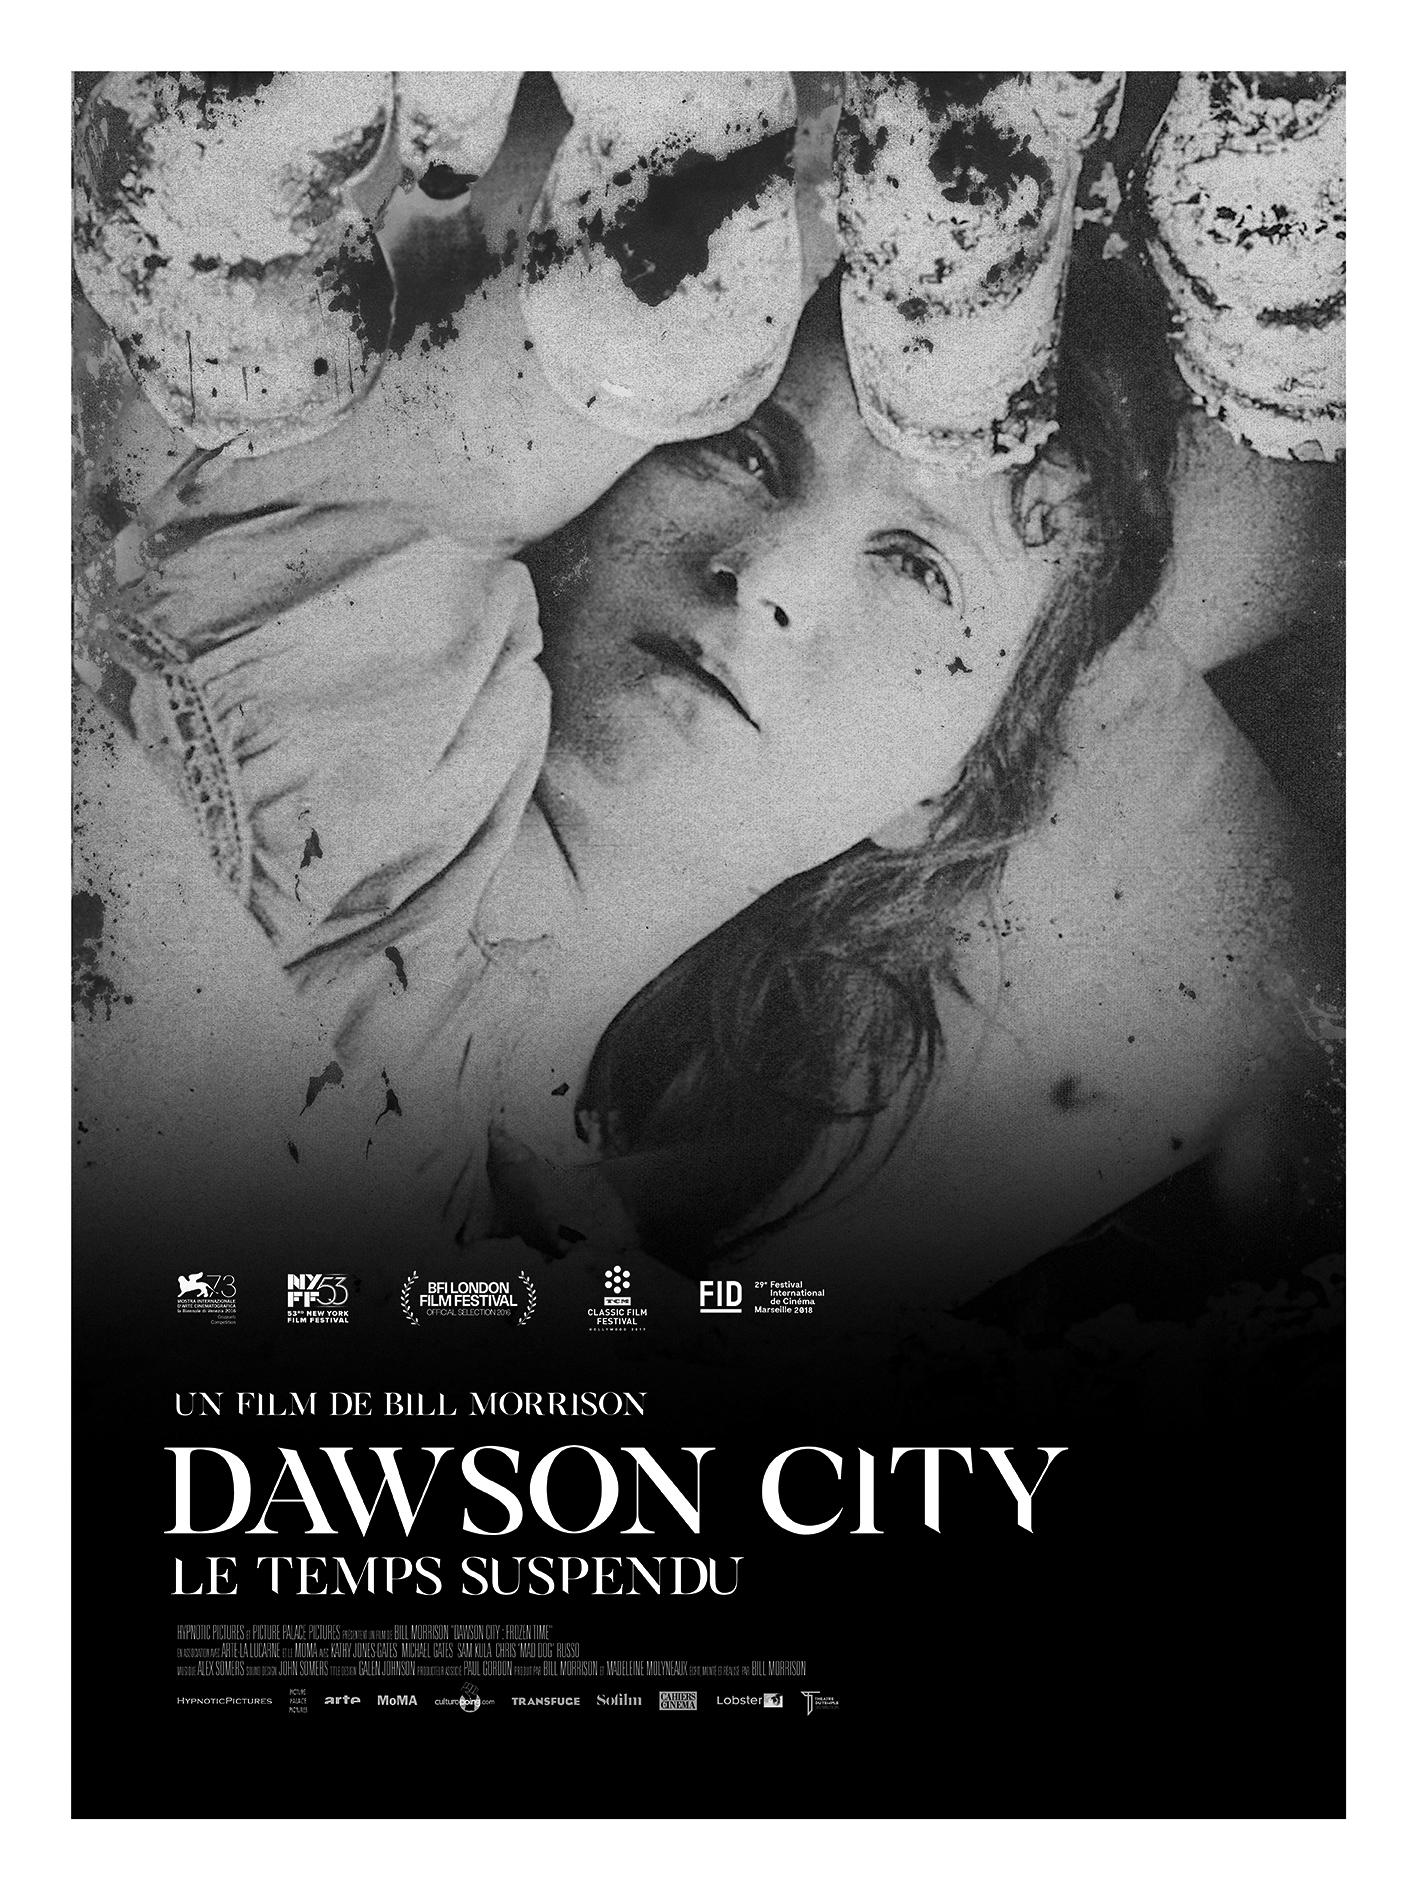 Dawson city Le temps suspendu